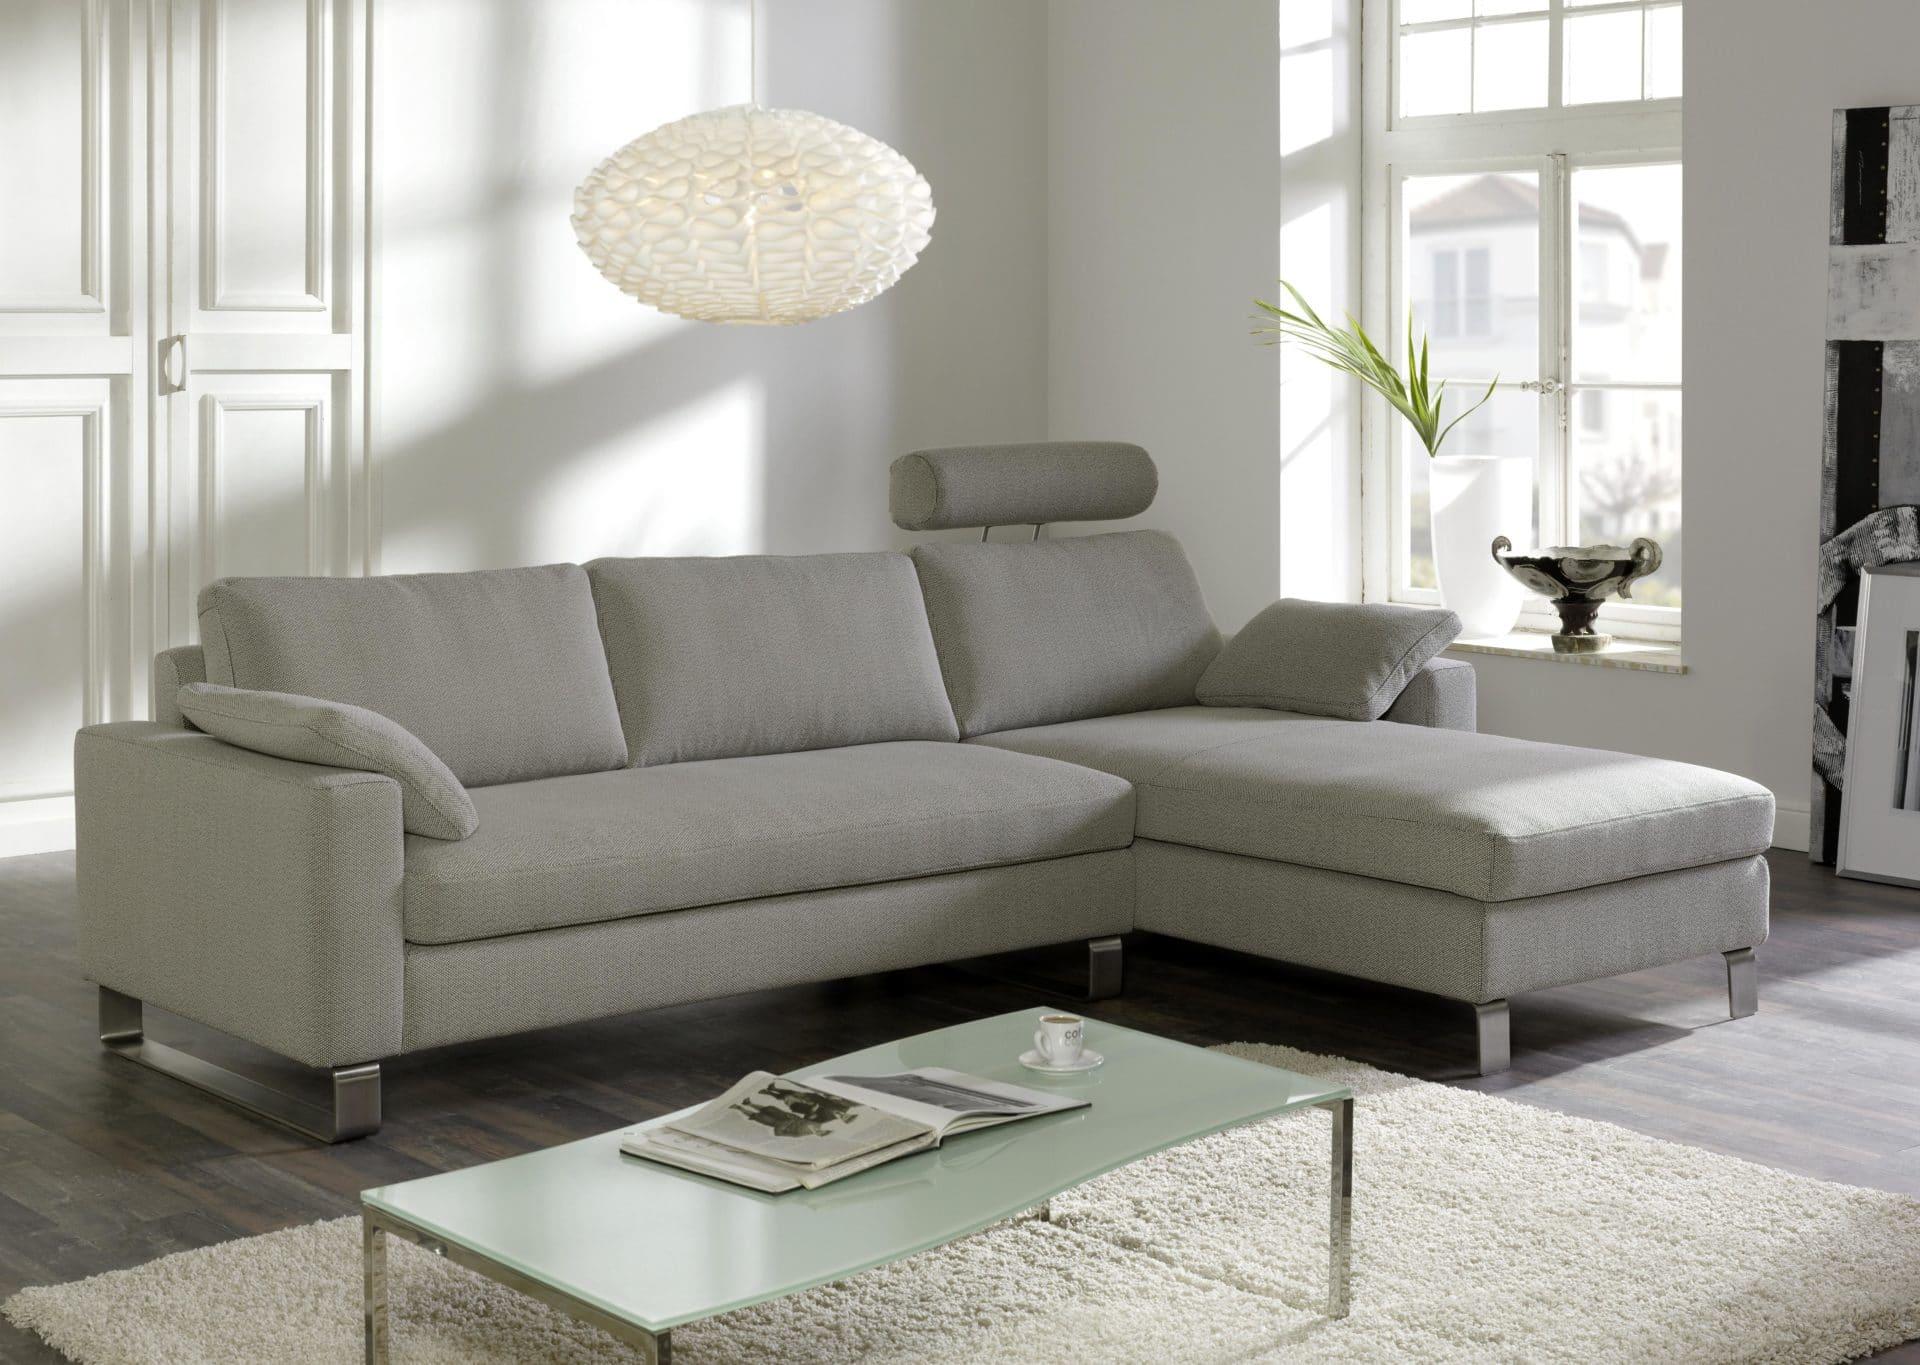 milieu sofasystem siena 2 5 sitzer ko control. Black Bedroom Furniture Sets. Home Design Ideas